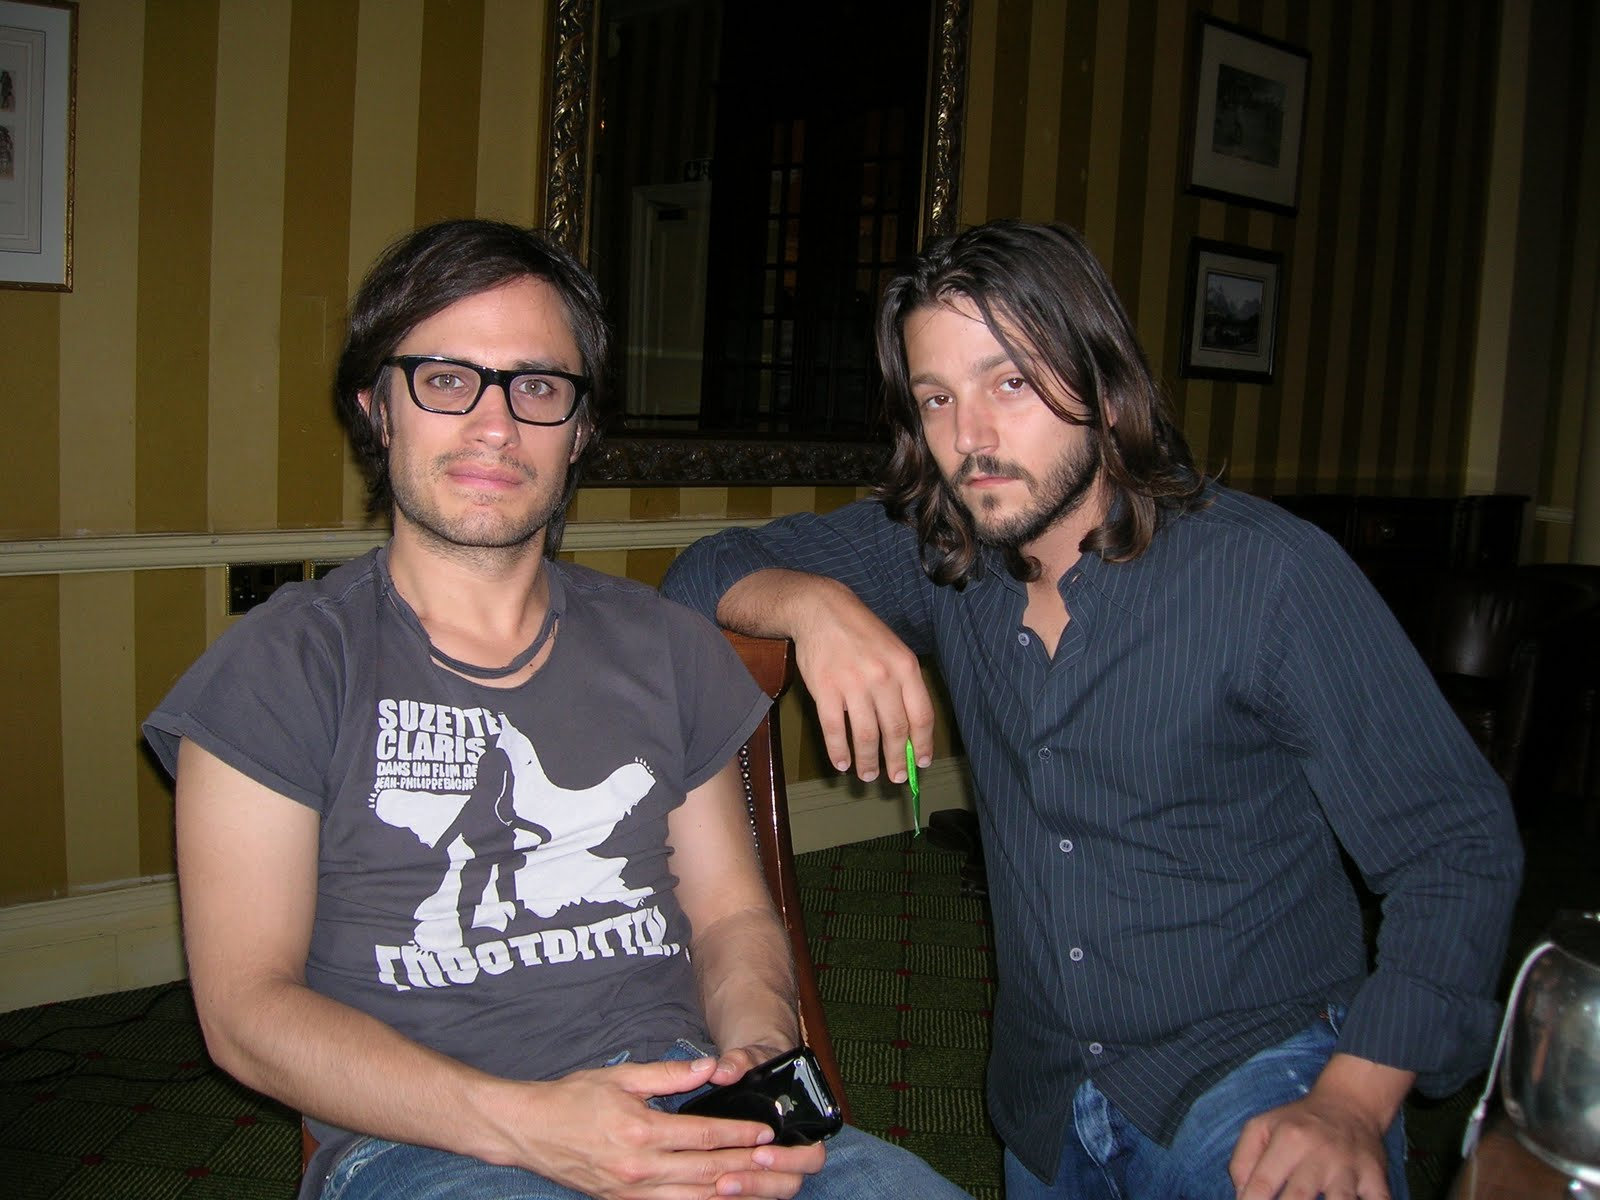 http://4.bp.blogspot.com/_gHebPvjbFpY/TJ-kty3buoI/AAAAAAAAAic/FnqzRDfwMMk/s1600/Gael+Garcia+Bernal+and+Diego+Luna.JPG